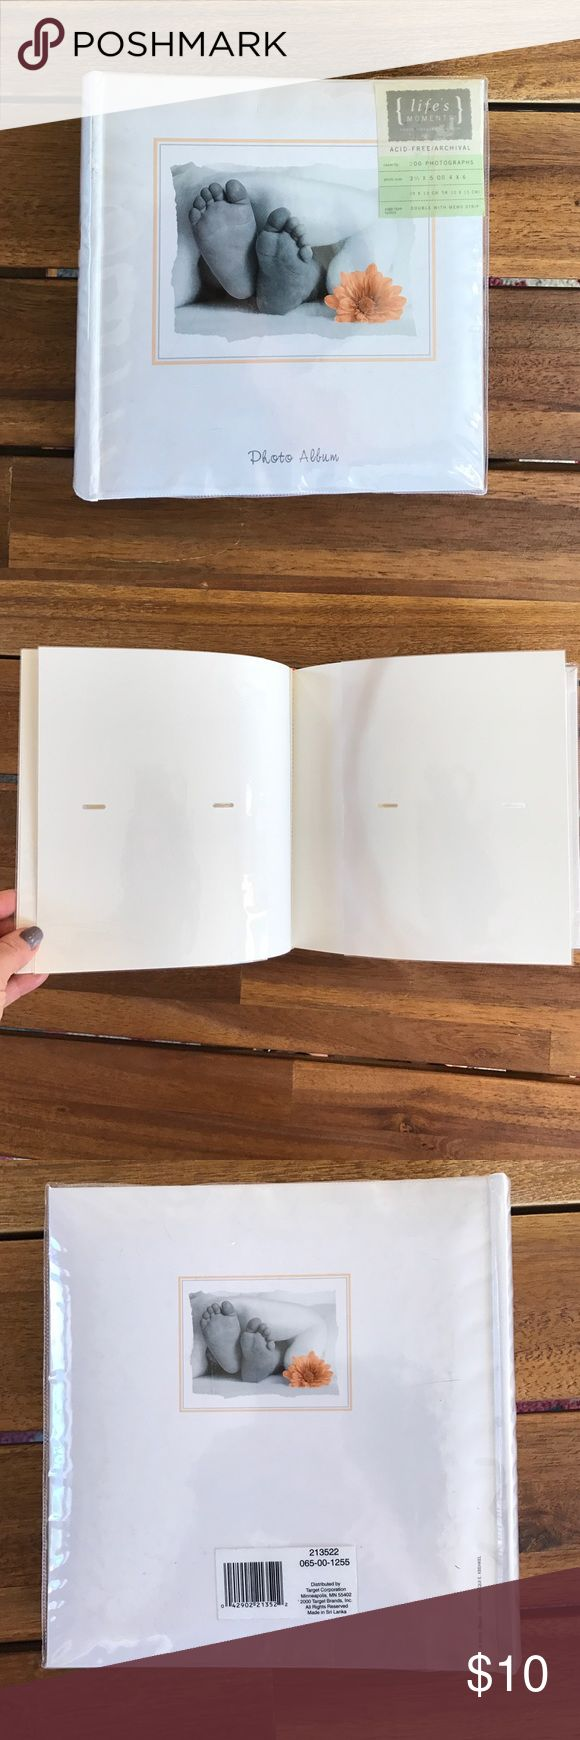 Baby Photo Album Holds 200 photos // 3.5 x 5 or 4 x 6 photos Other